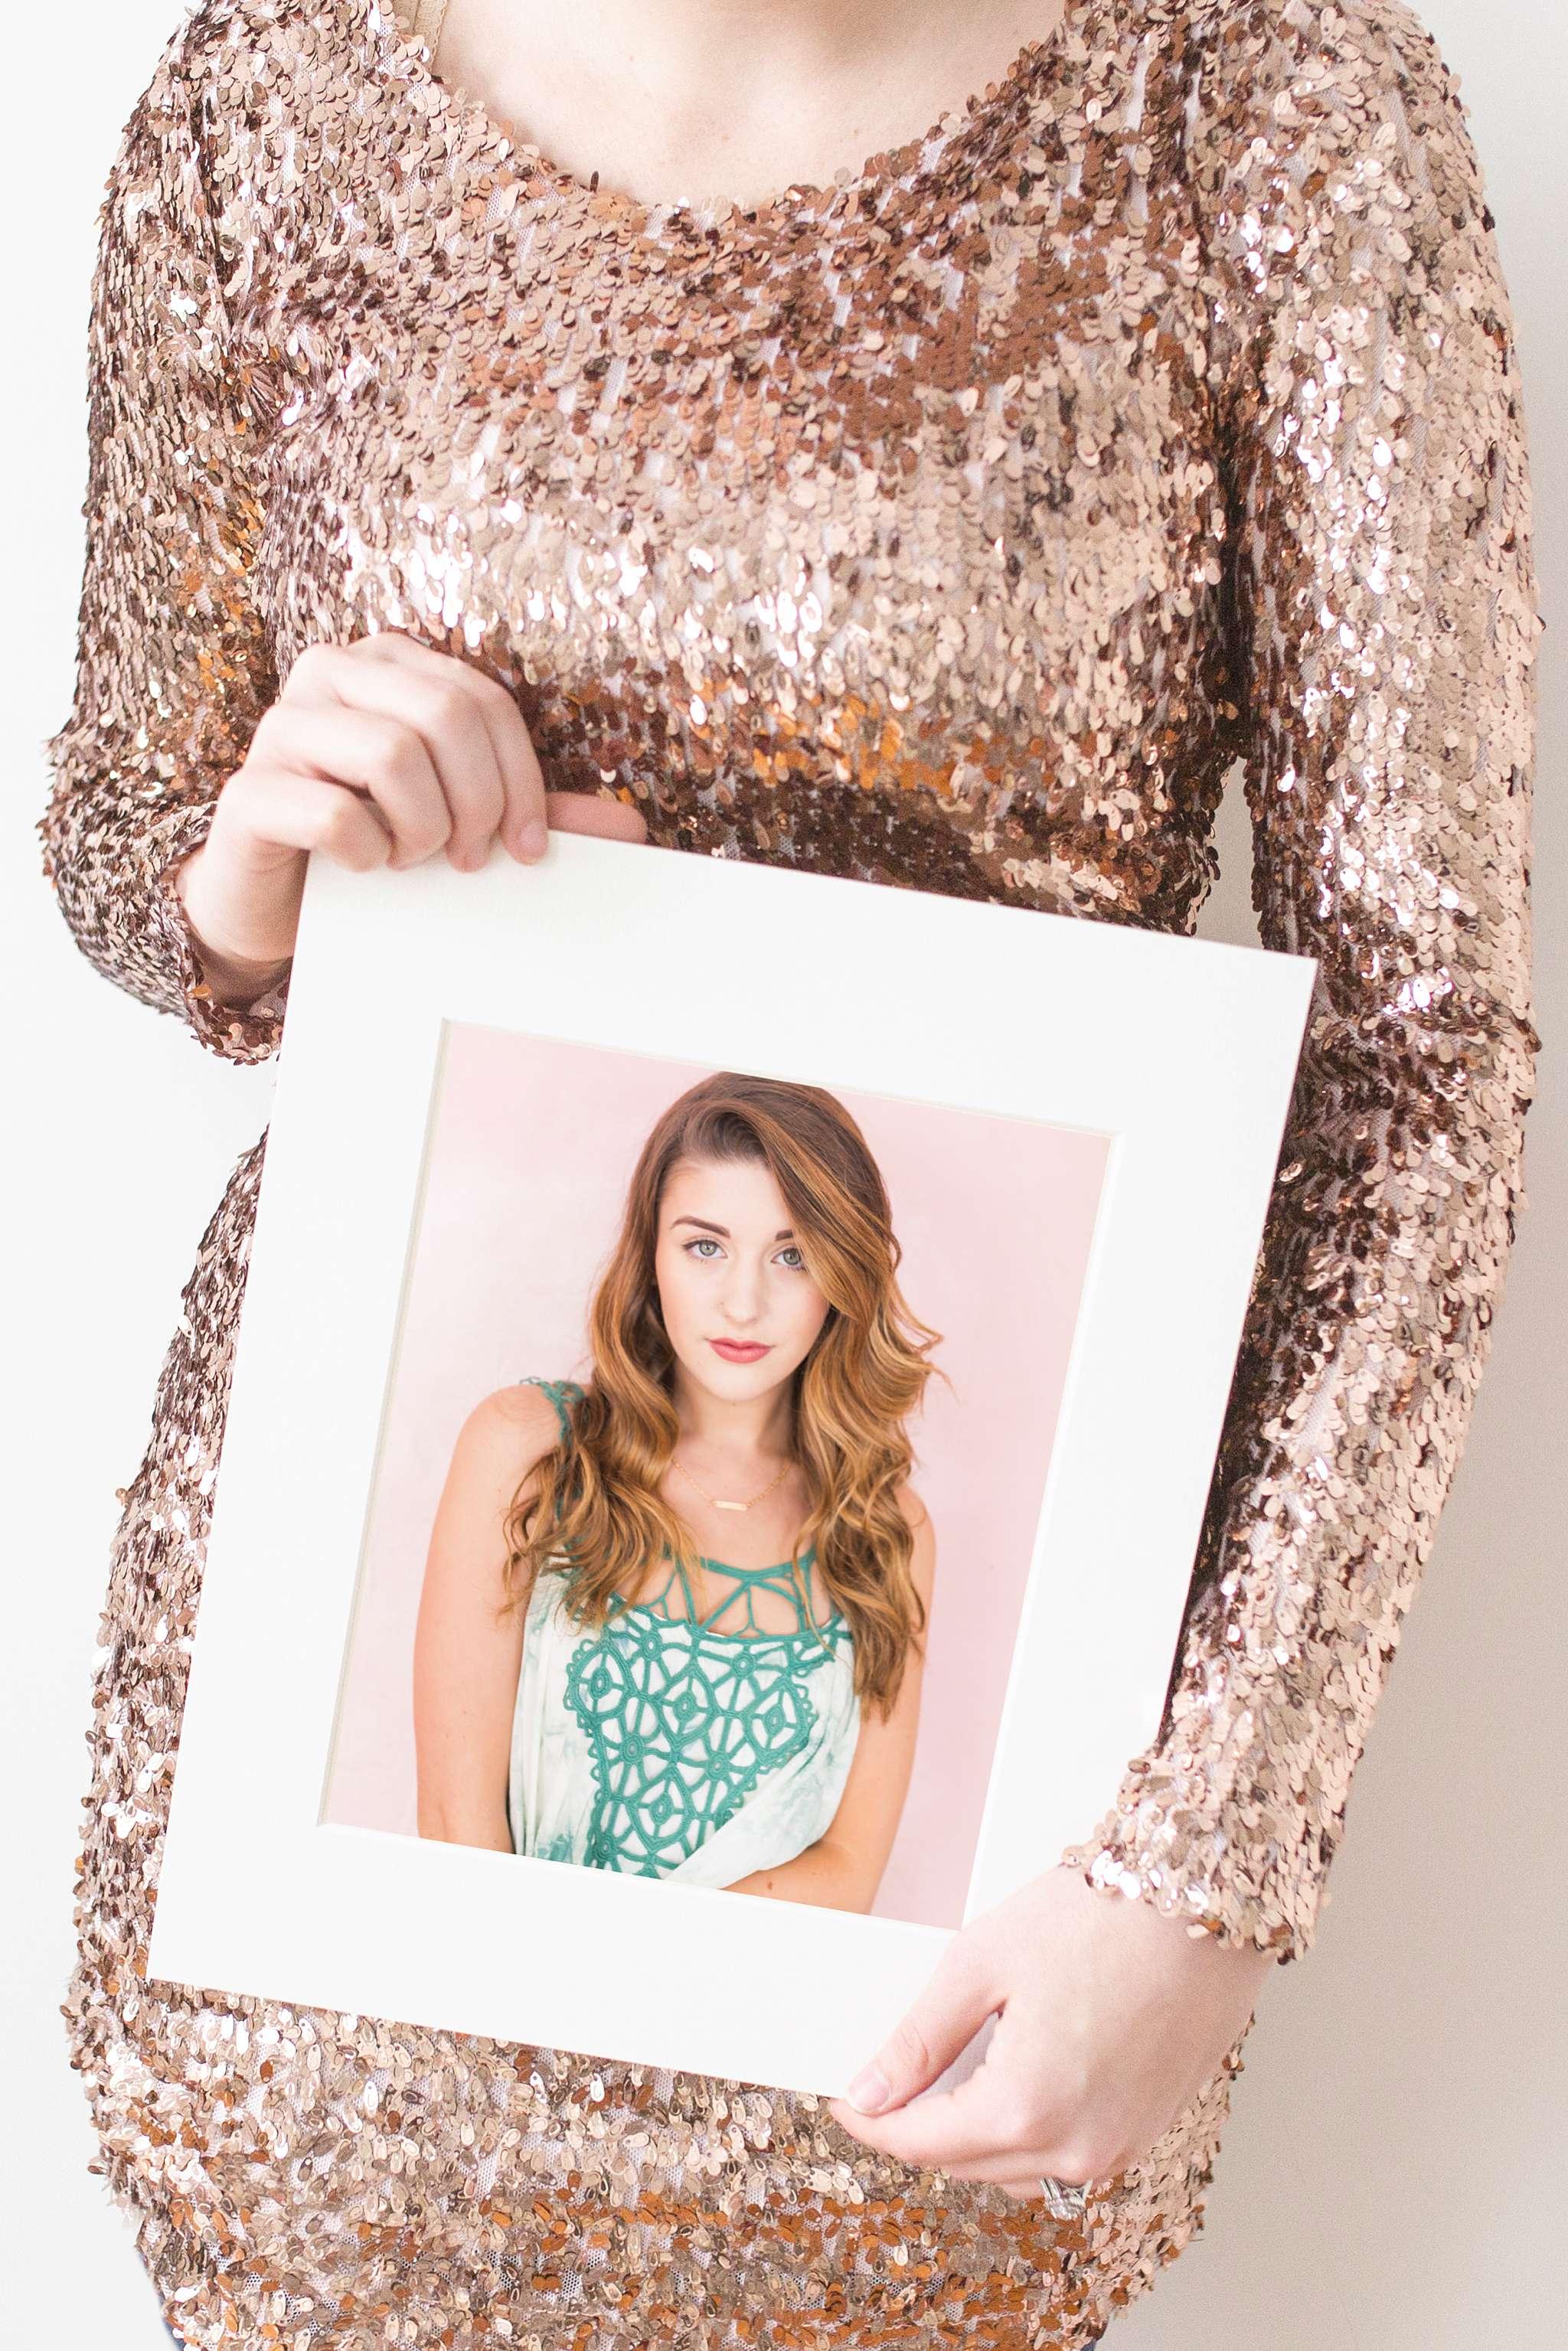 amber-nicole-portrait-gift-card-purchse-photo-shoot